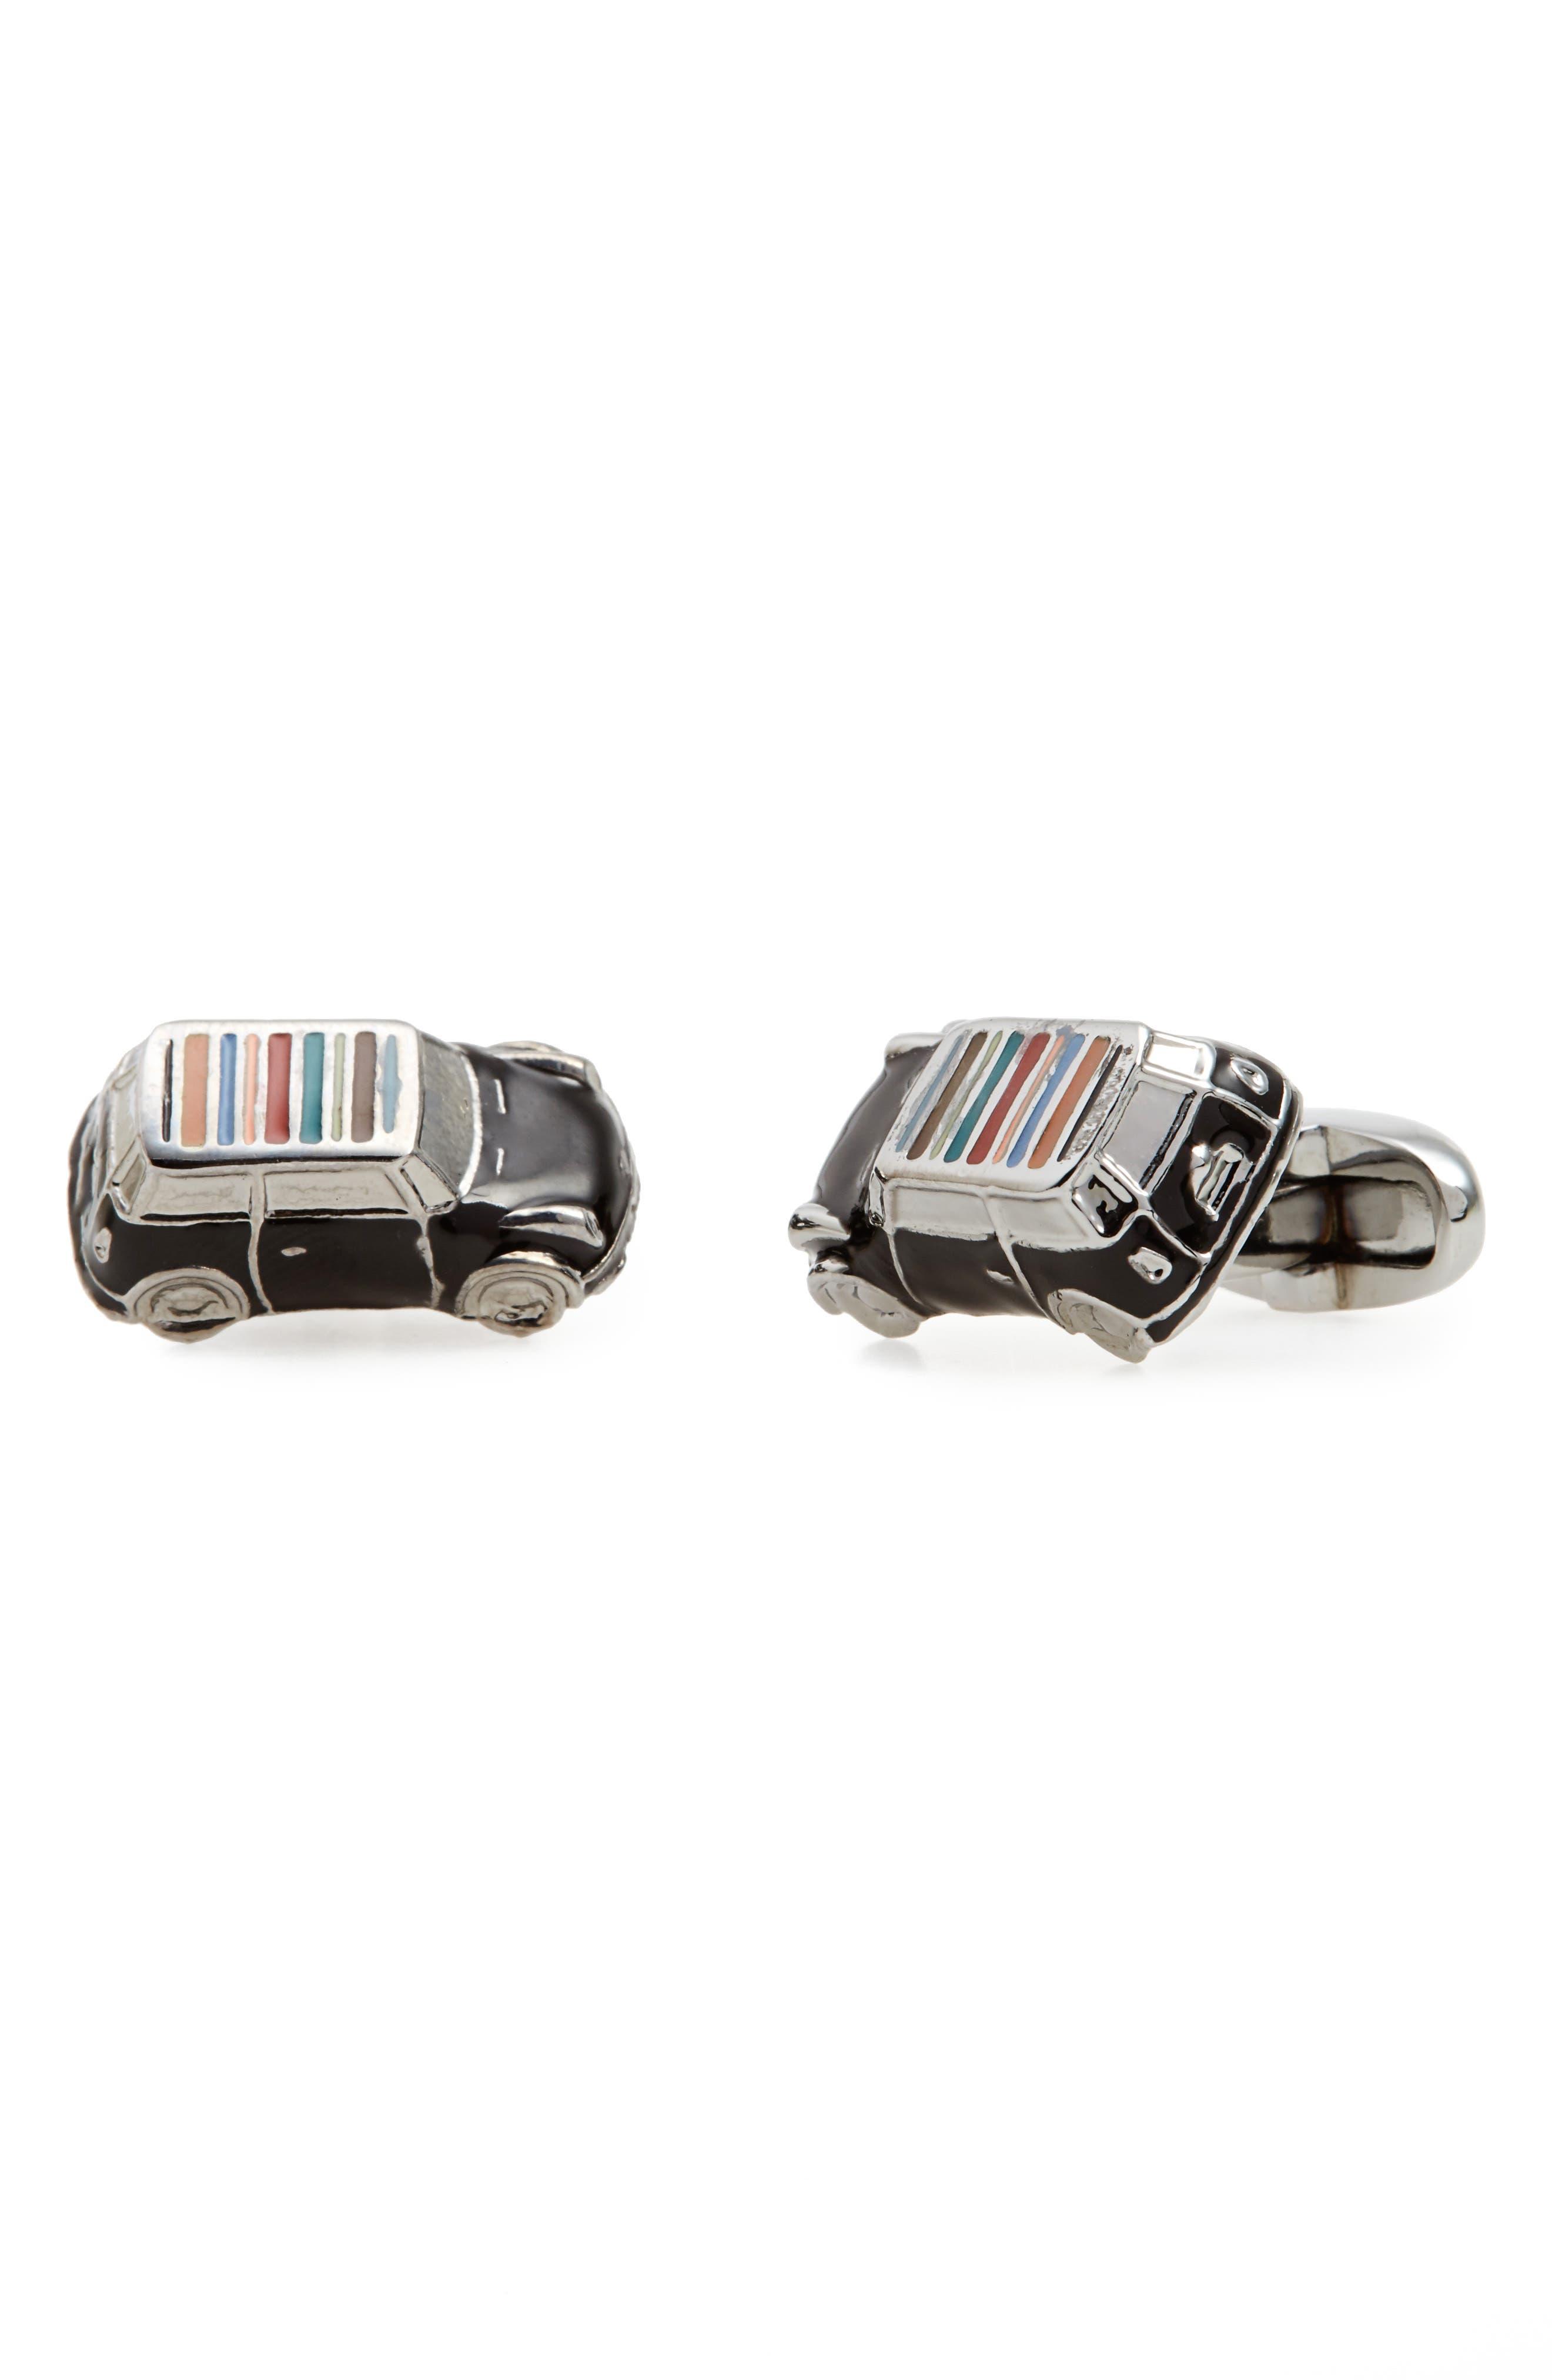 Enamel Stripe Car Cuff Links,                             Main thumbnail 1, color,                             040